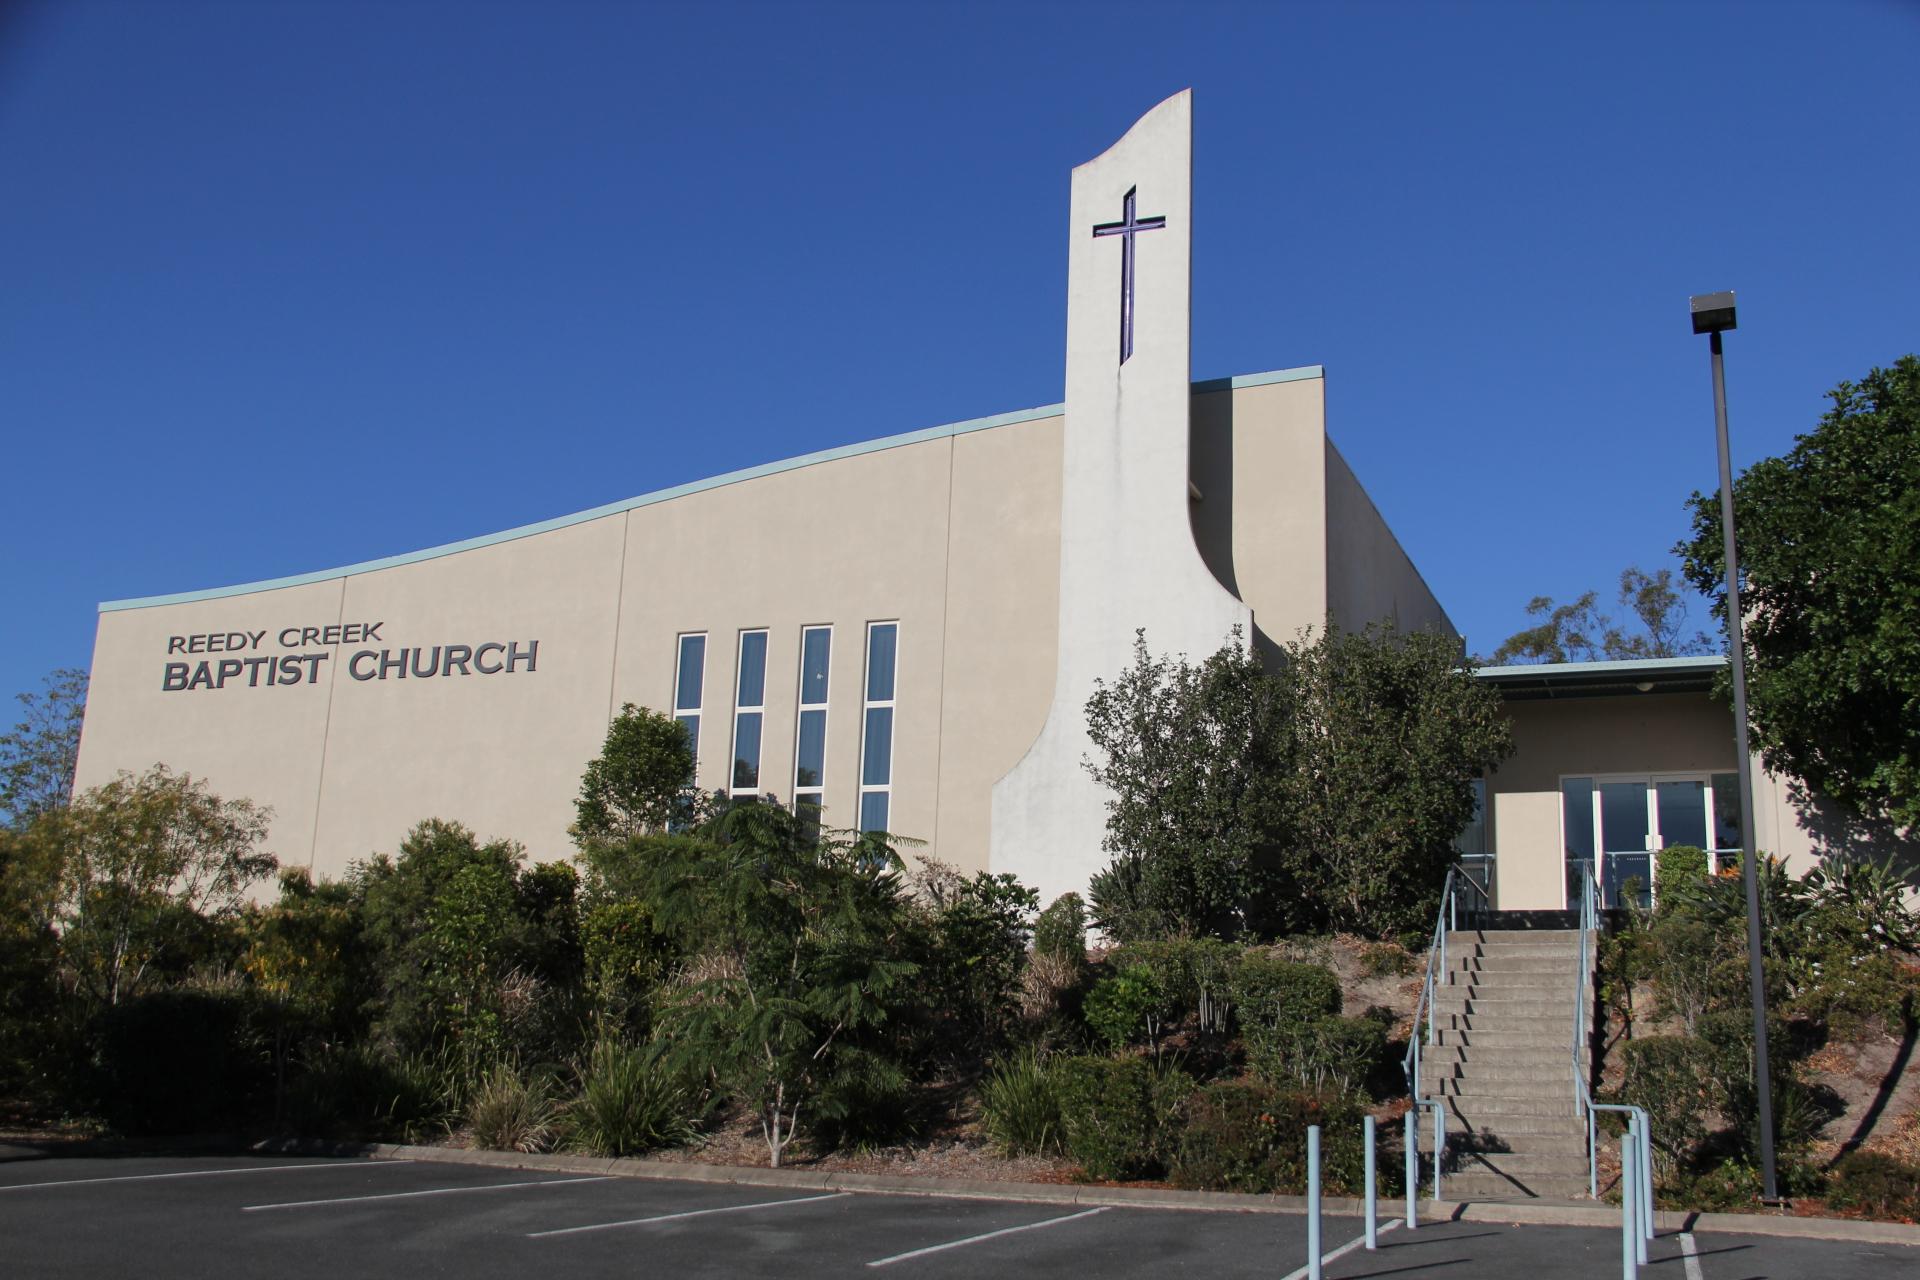 Reedy Creek Baptist Church